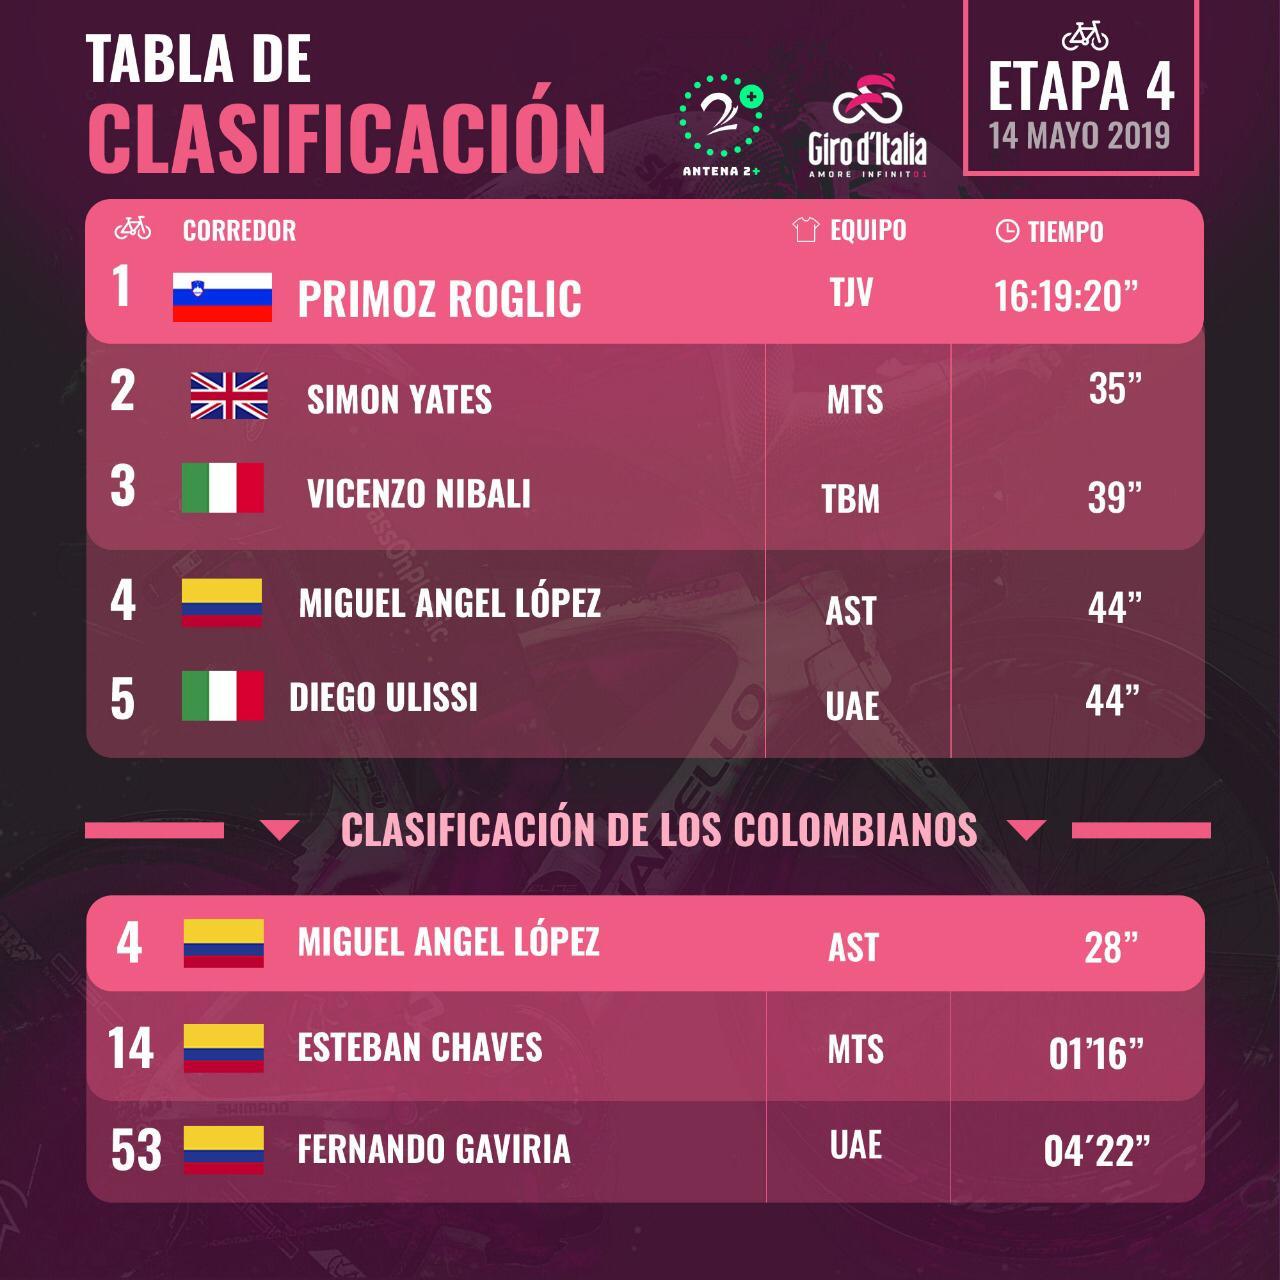 Clasificación del Giro de Italia, tras la 4 etapa